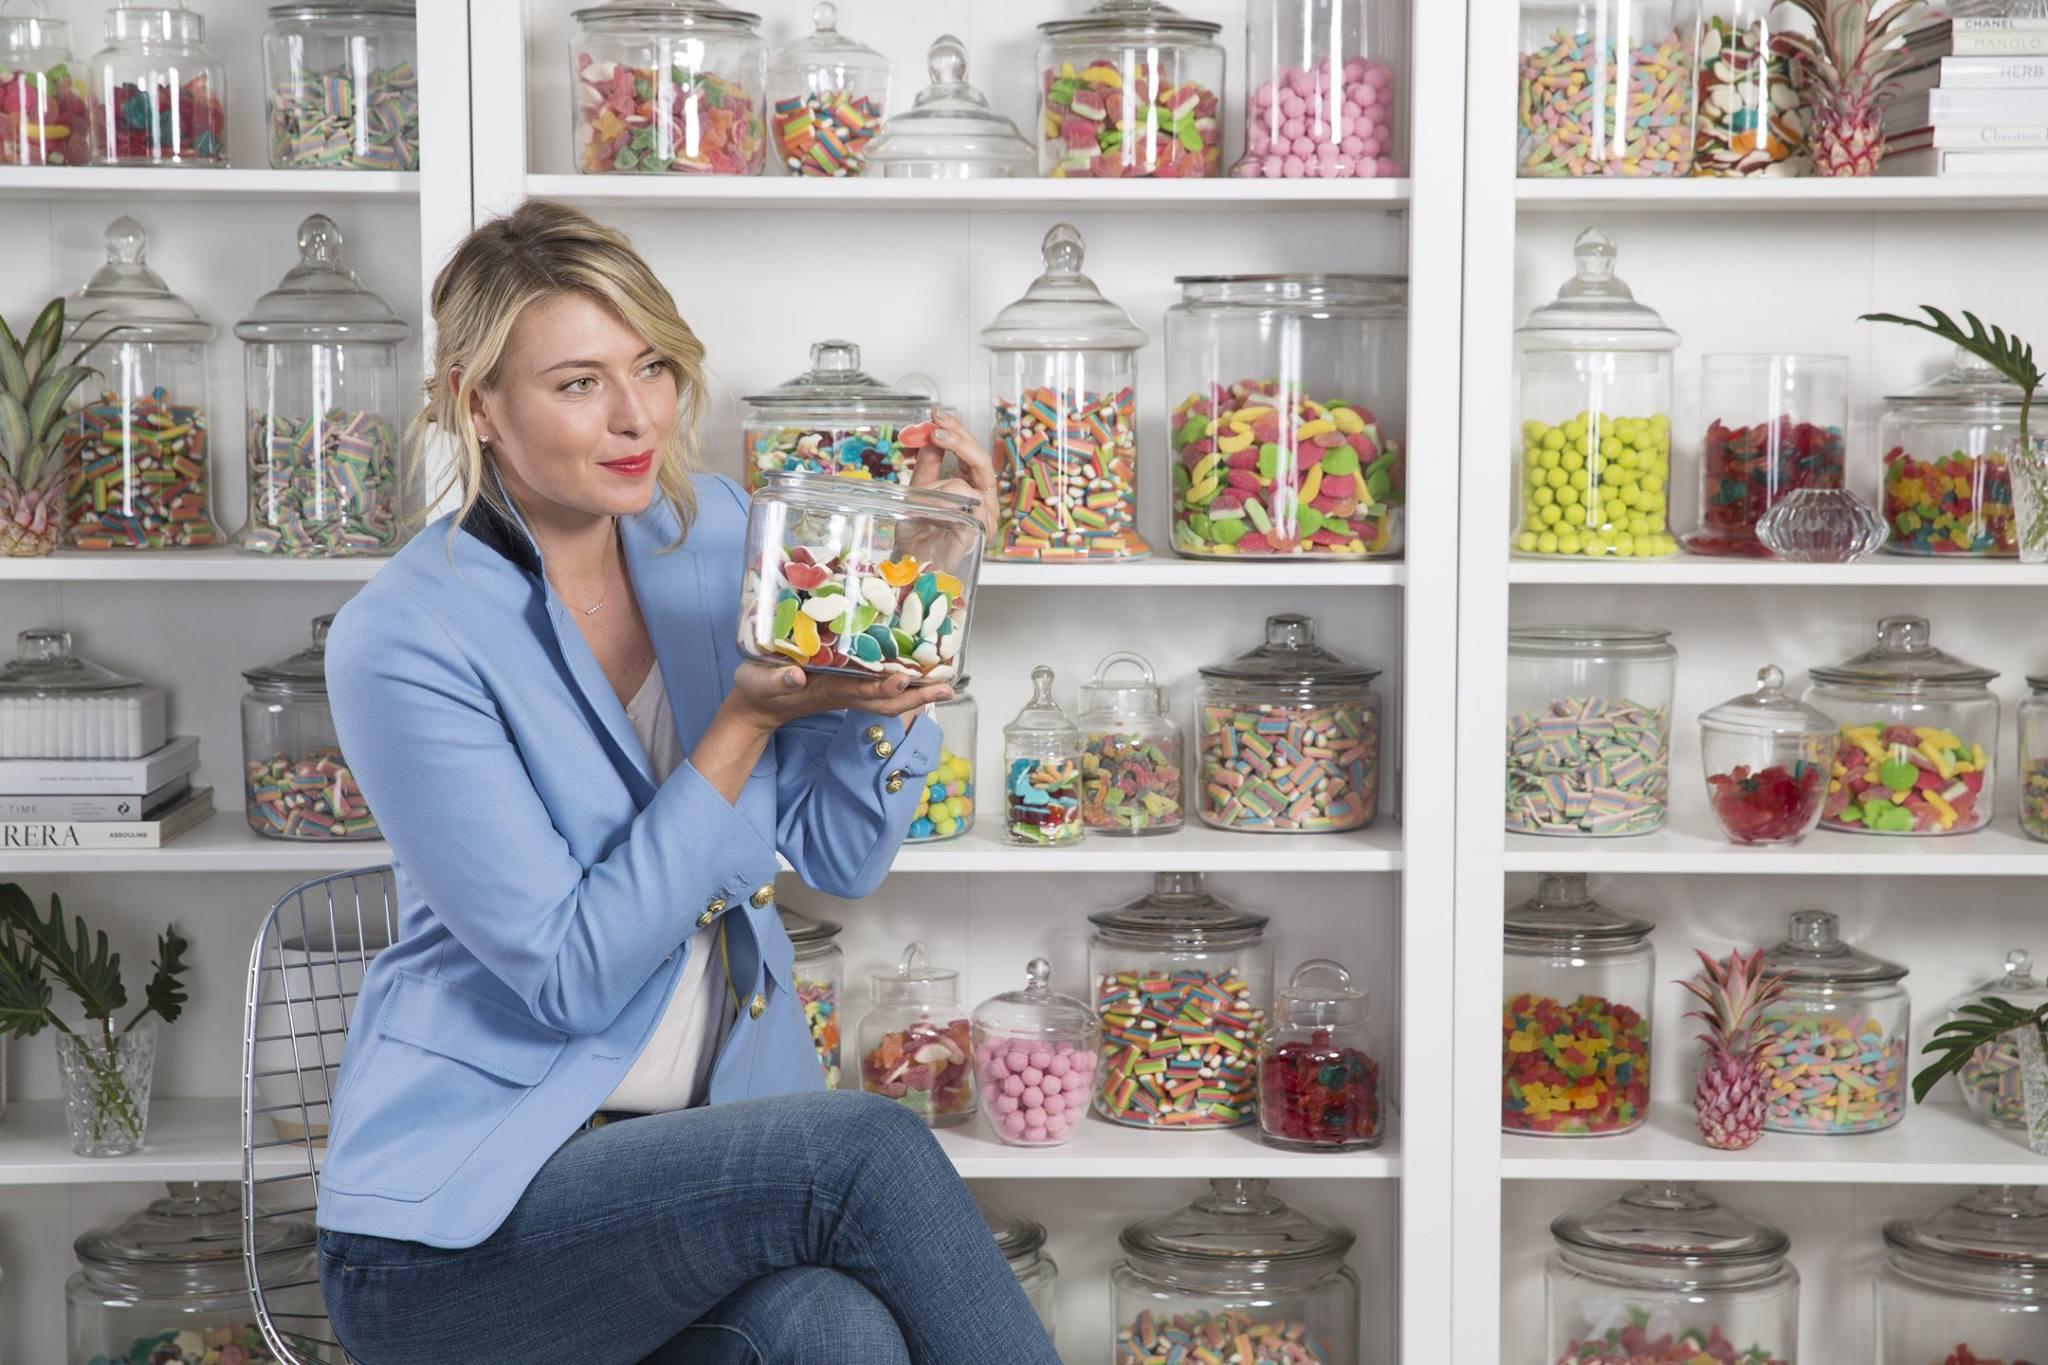 Maria Sharipova with jars of candy